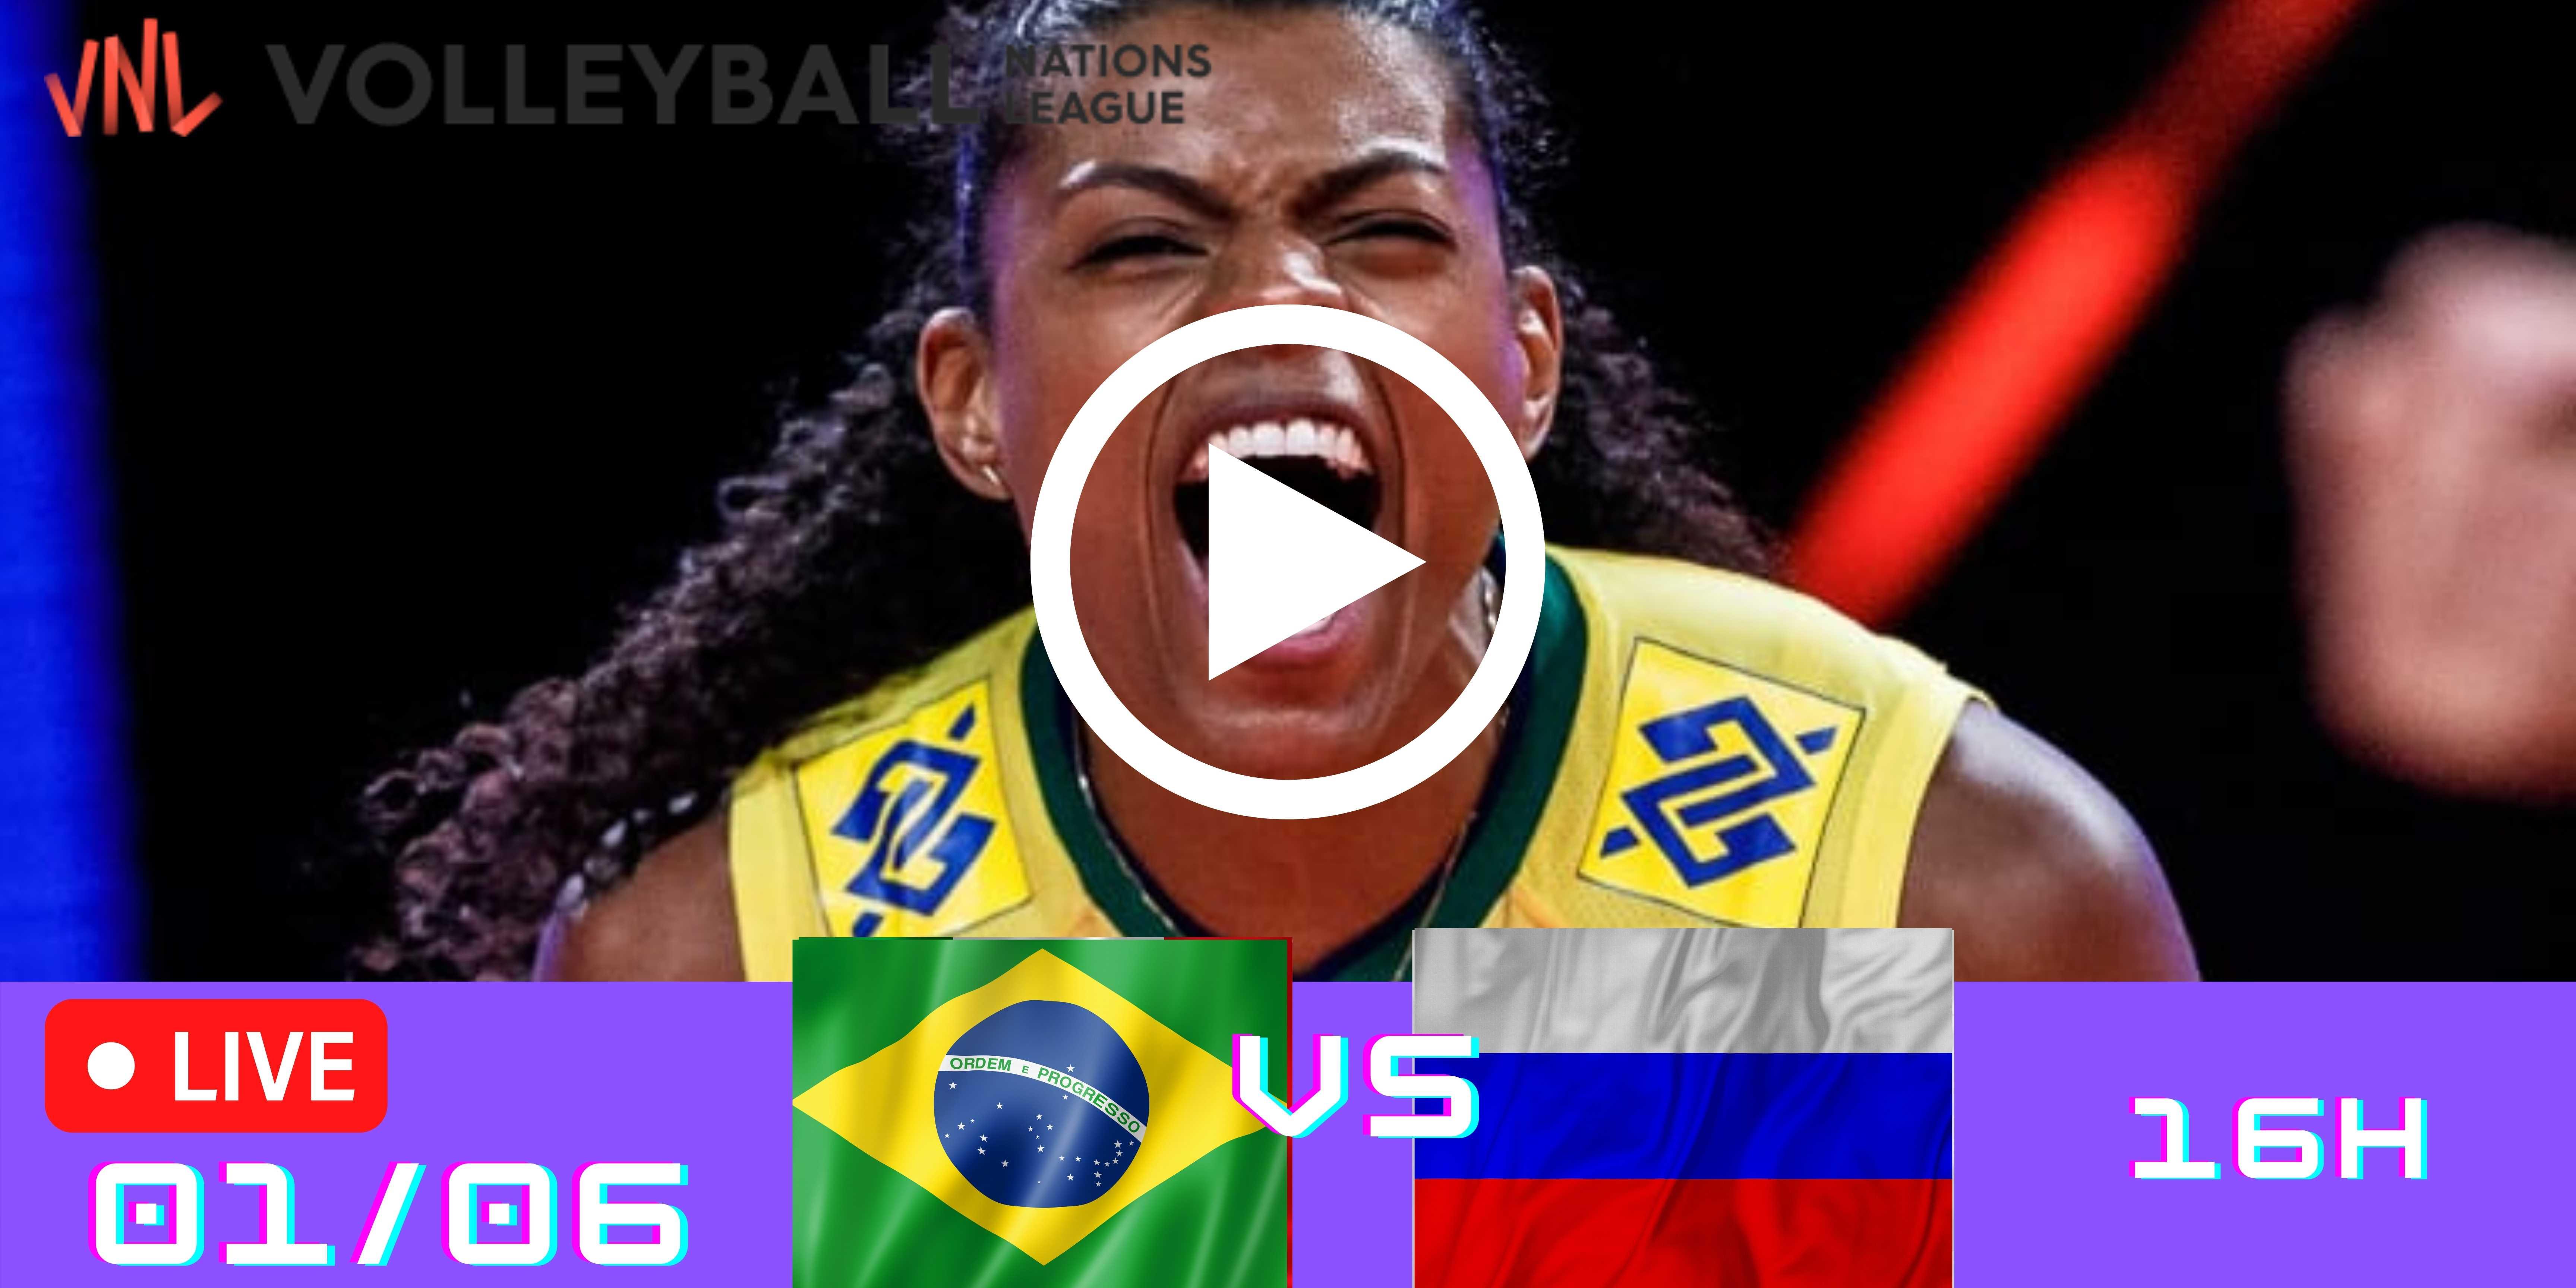 Resultado: Brasil vs Rússia – Liga das Nações – 01/06 – 16h